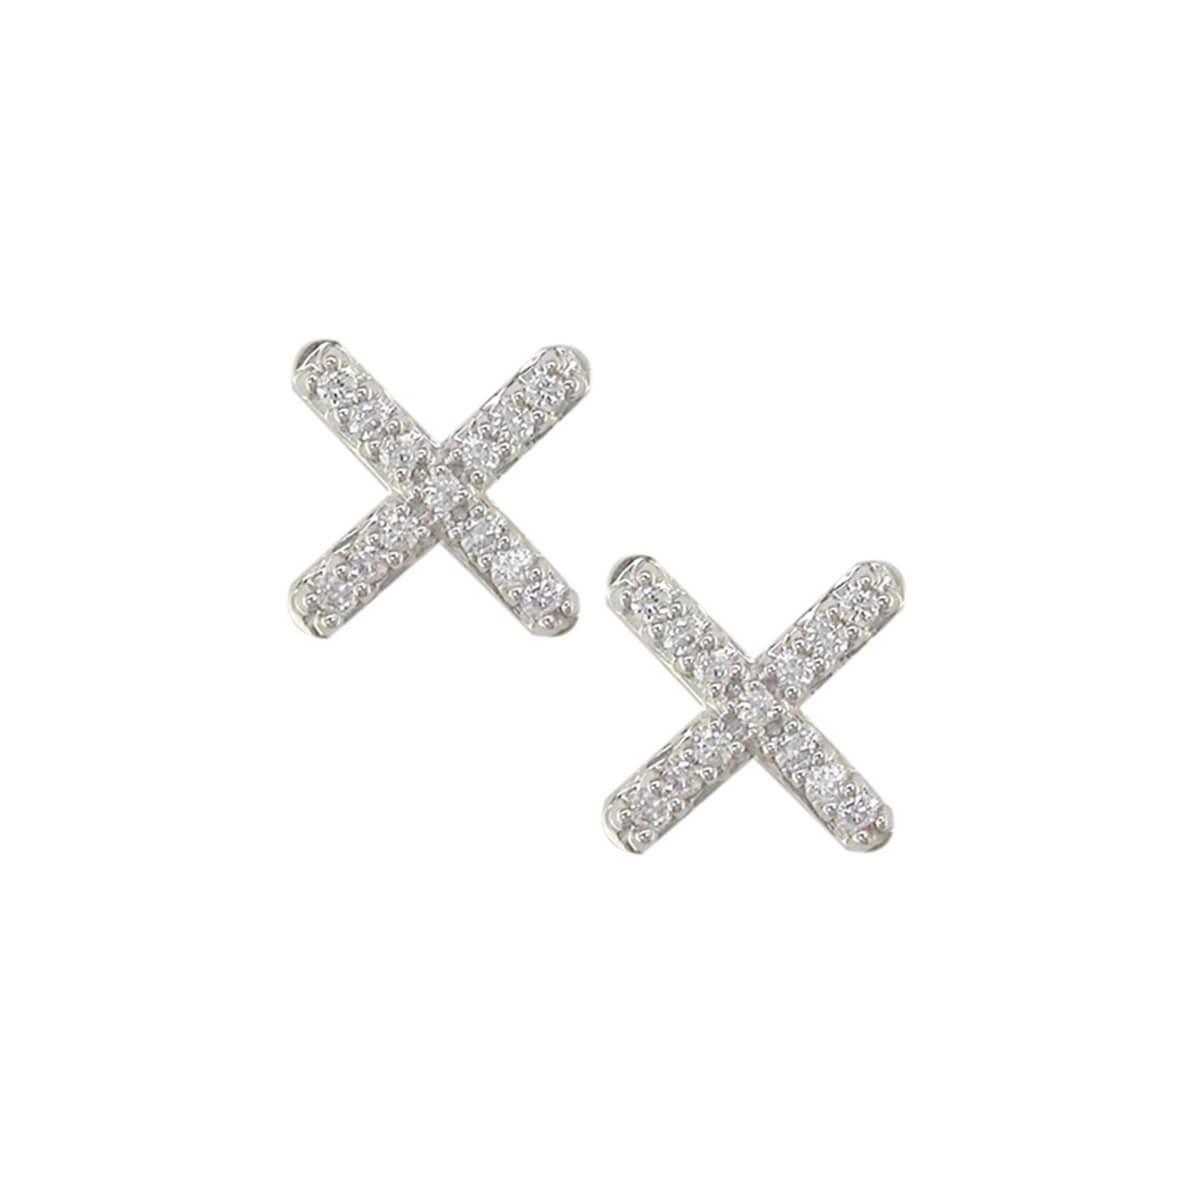 London Road Jewellery White Gold Diamond Geo Bar Stud Earrings oNWxPdmLyd